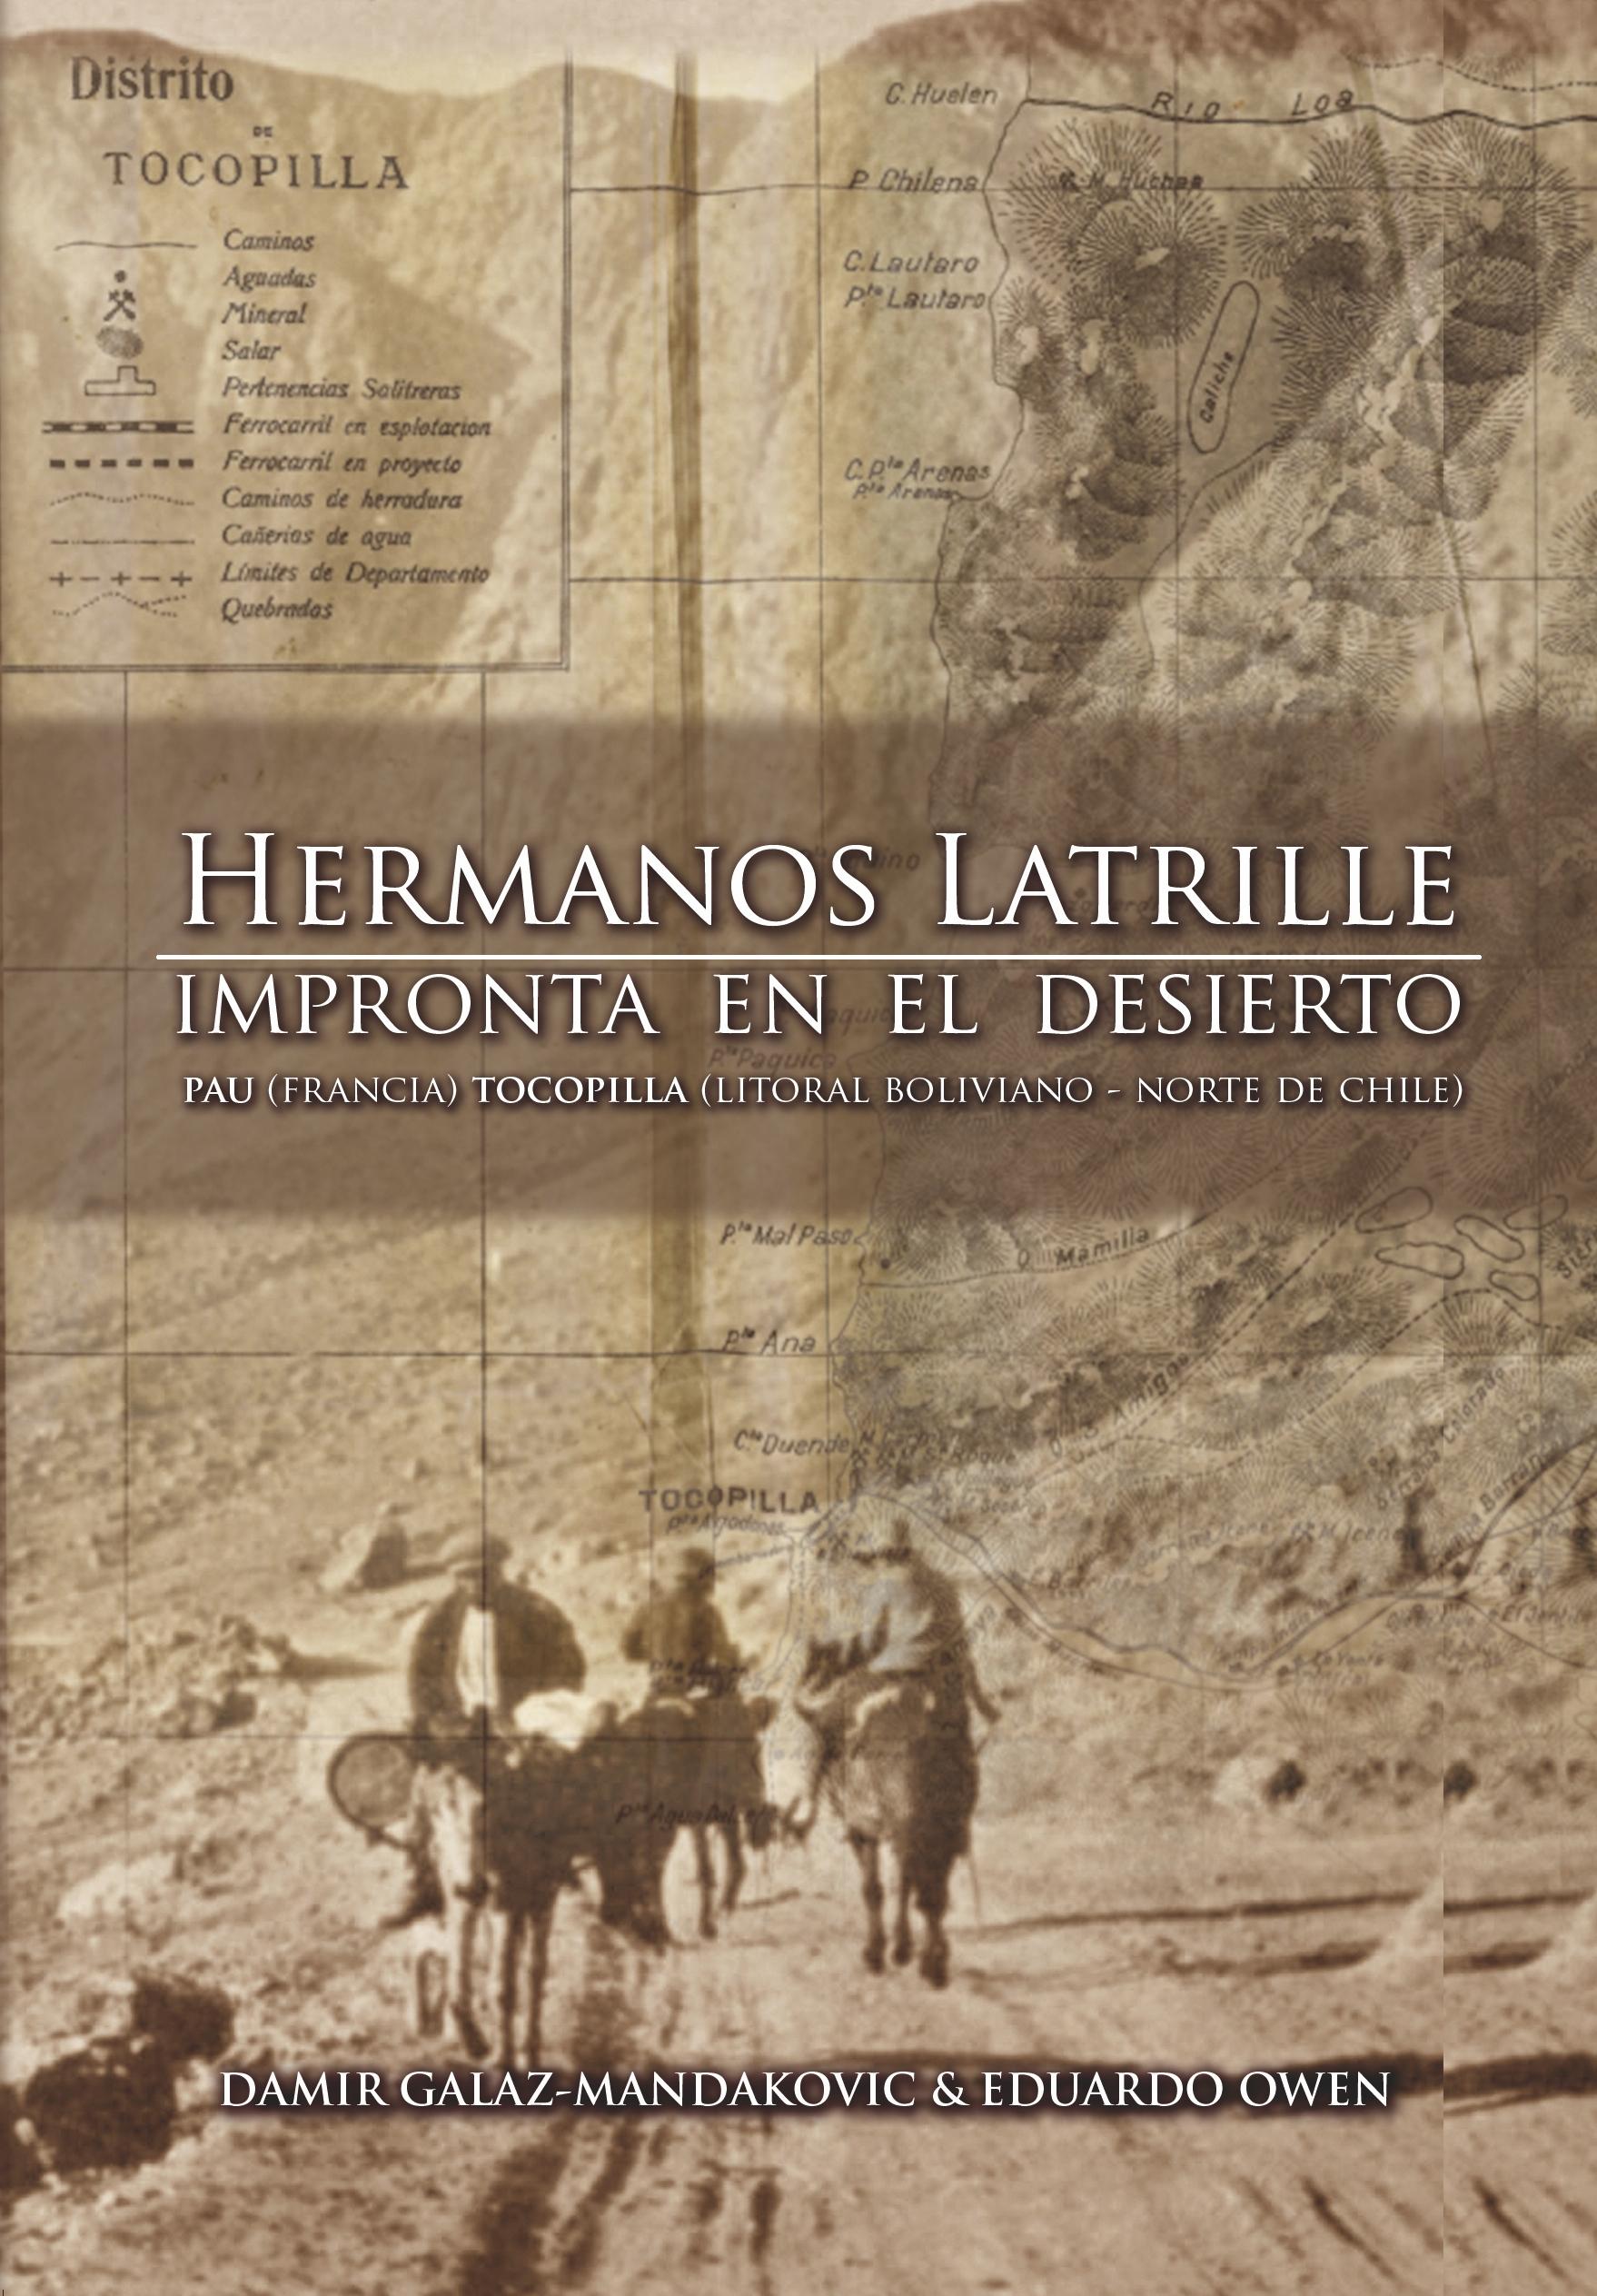 HERMANOS LATRILLE. IMPRONTA EN EL DESIERTO. DAMIR GALAZ-MANDAKOVIC Y EDUARDO OWEN